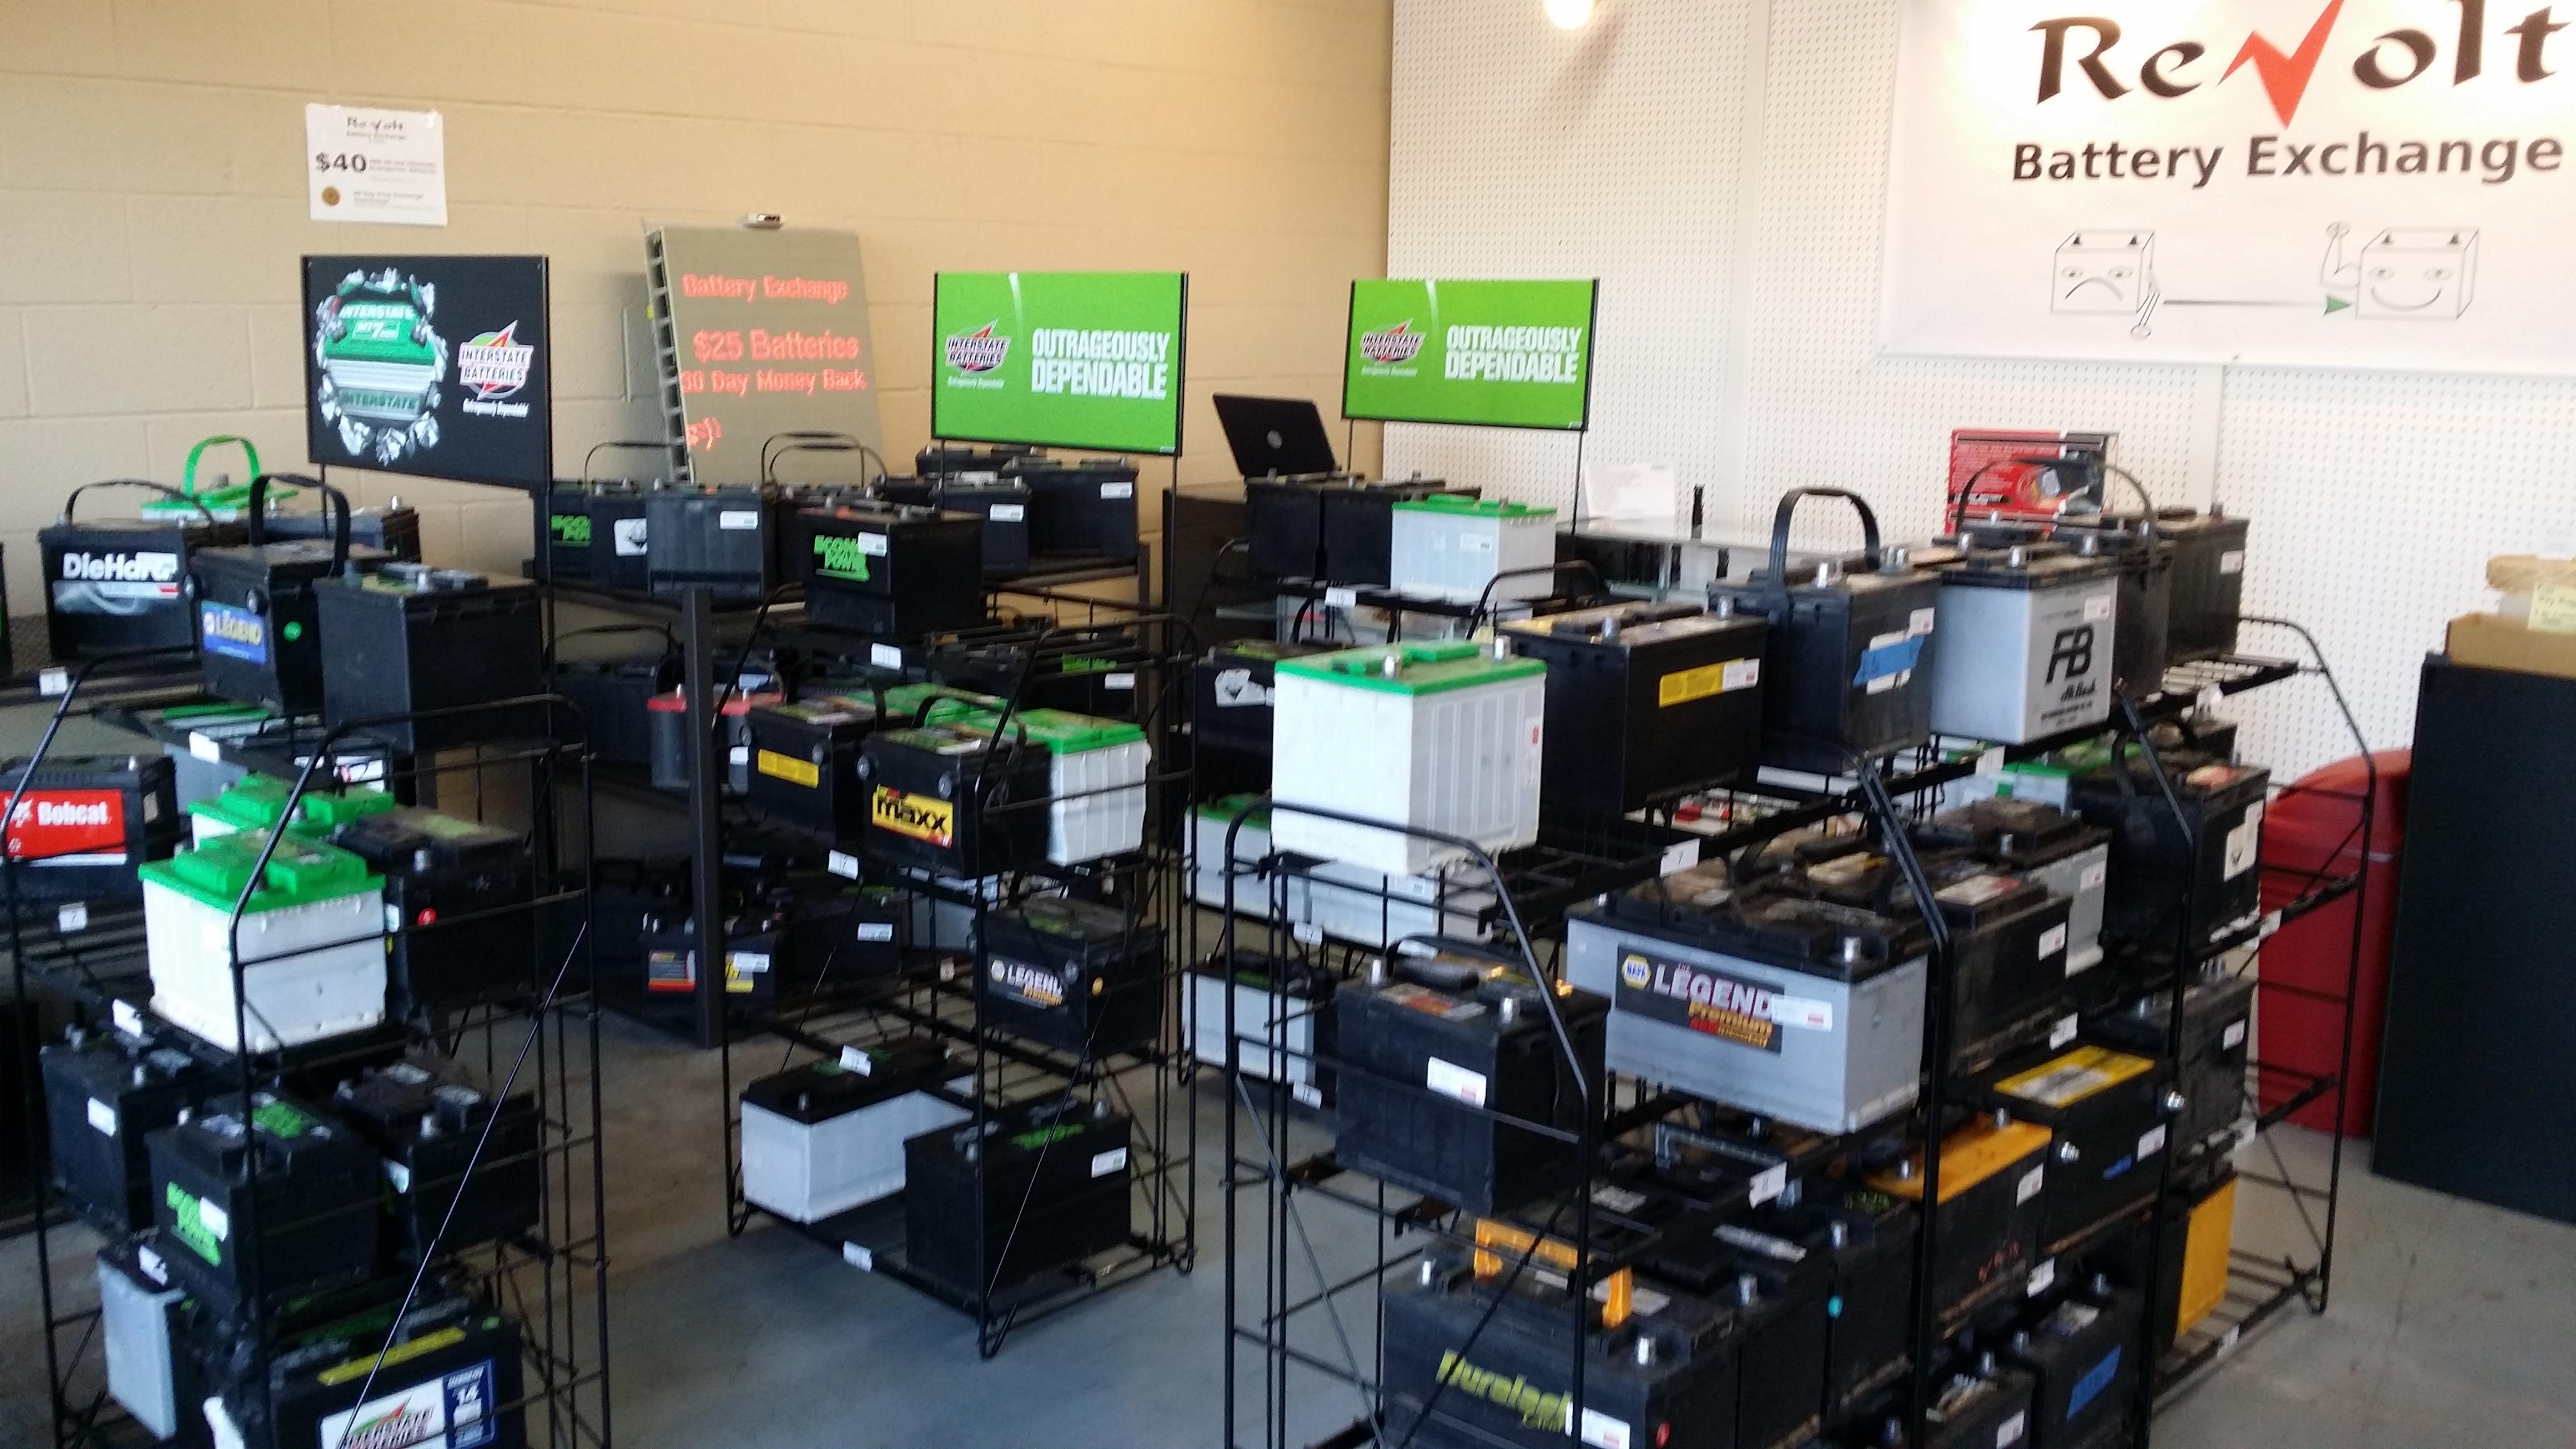 ReVolt Battery Exchange Store